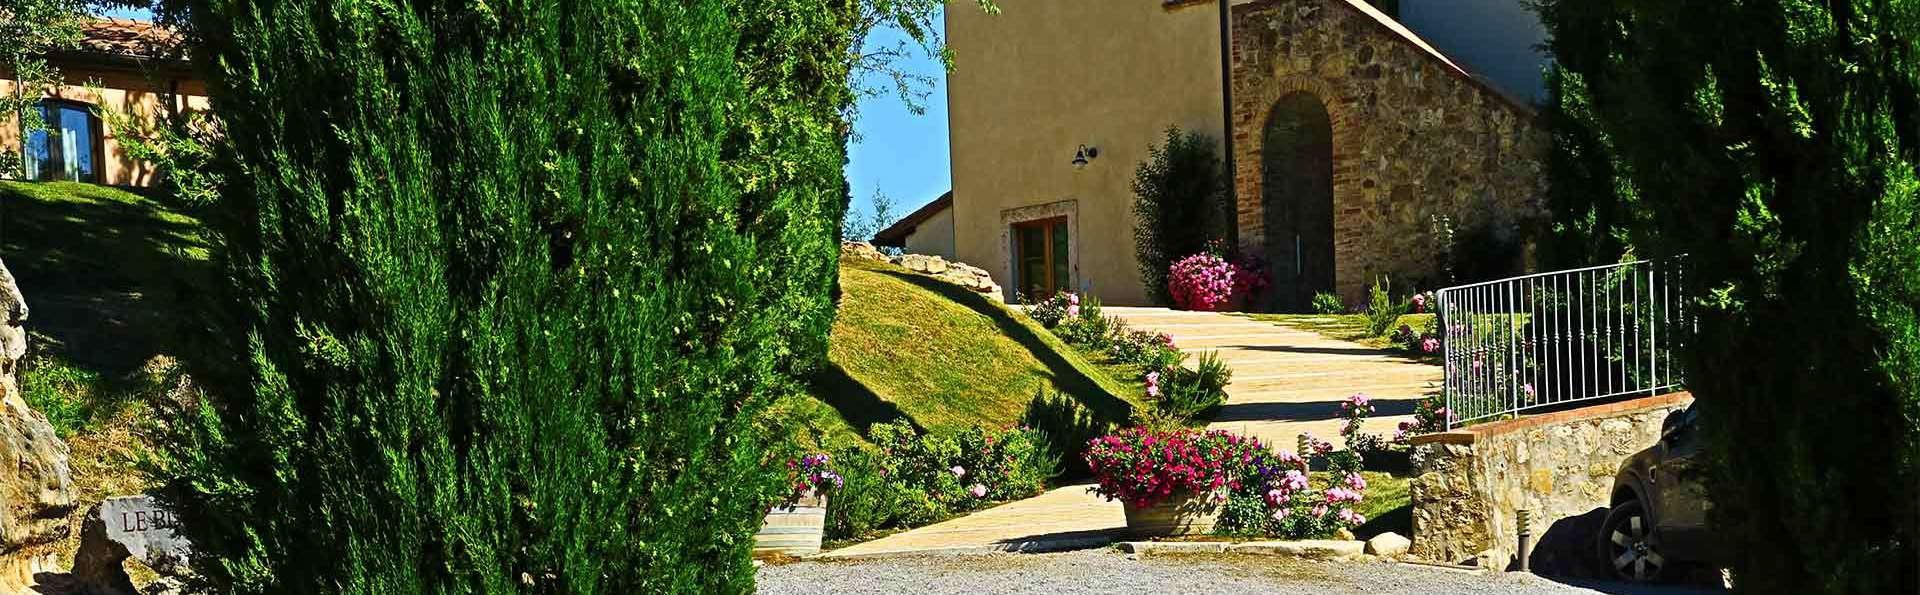 Le Buche Wine Resort & Spa - EDIT_EXTERIOR_03.jpg